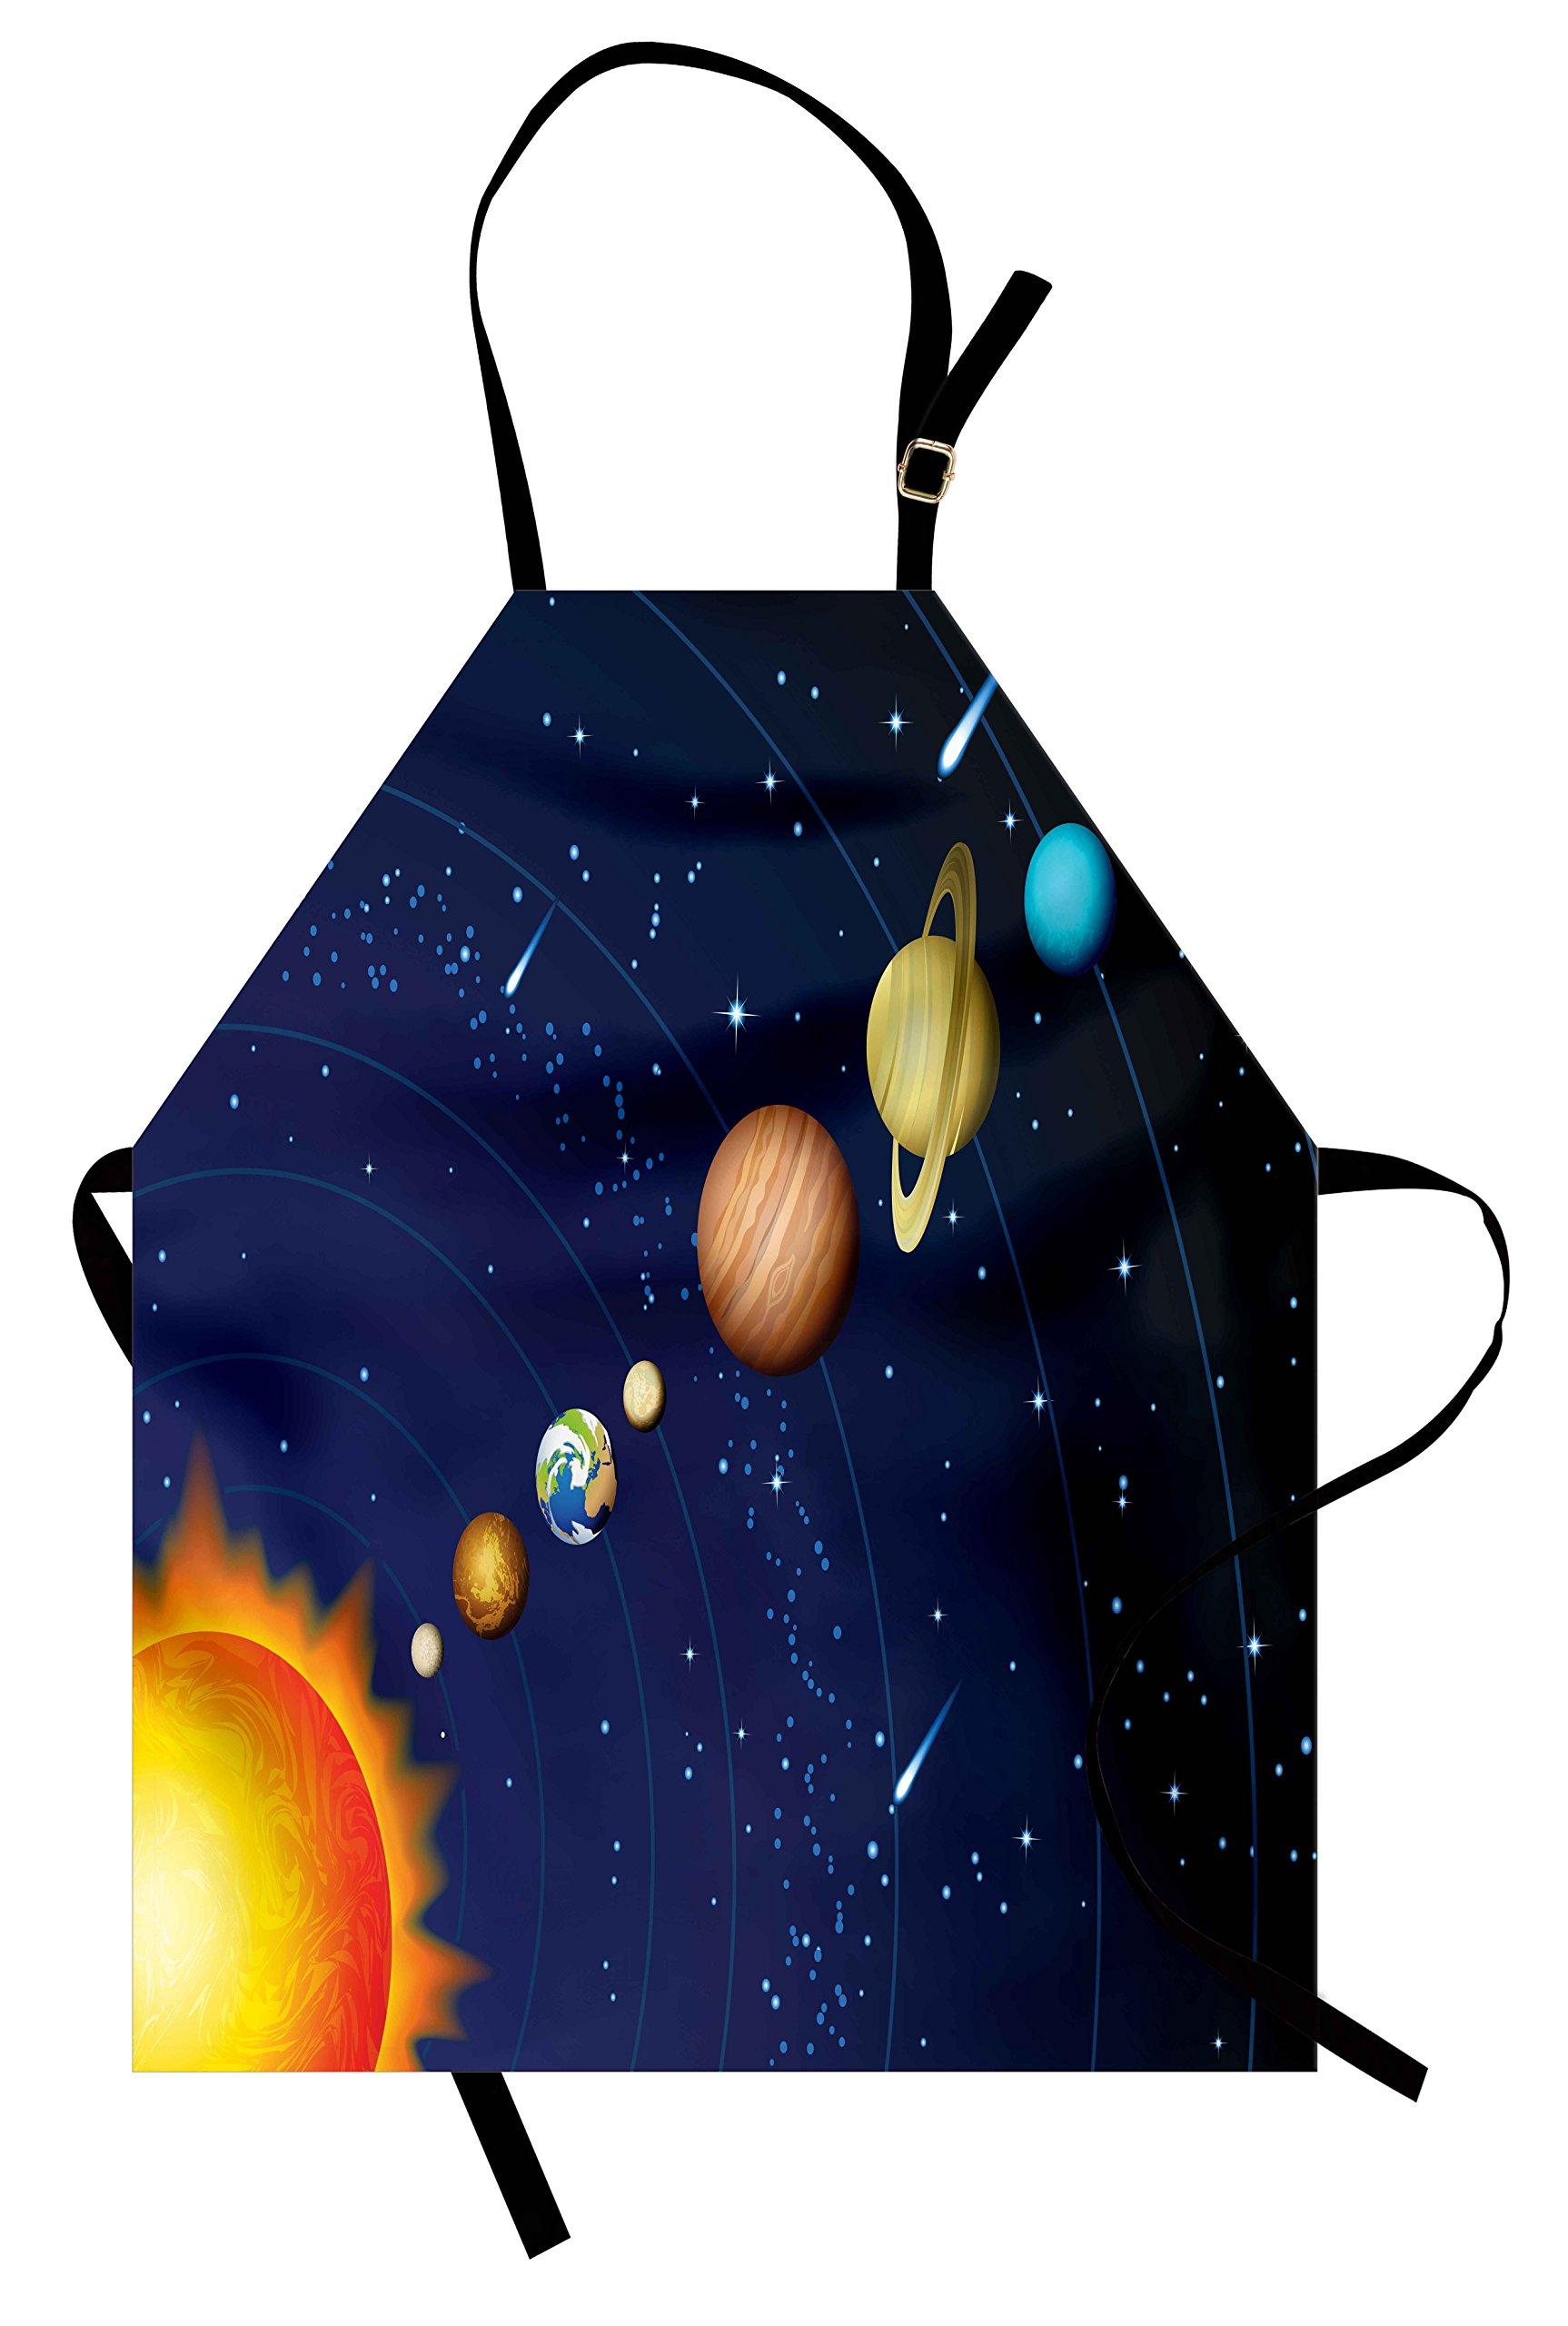 Ambesonne Space Apron, Solar System with Sun Uranus Venus Jupiter Mars Pluto Saturn Neptune Image, Unisex Kitchen Bib Apron with Adjustable Neck for Cooking Baking Gardening, Dark Blue Orange